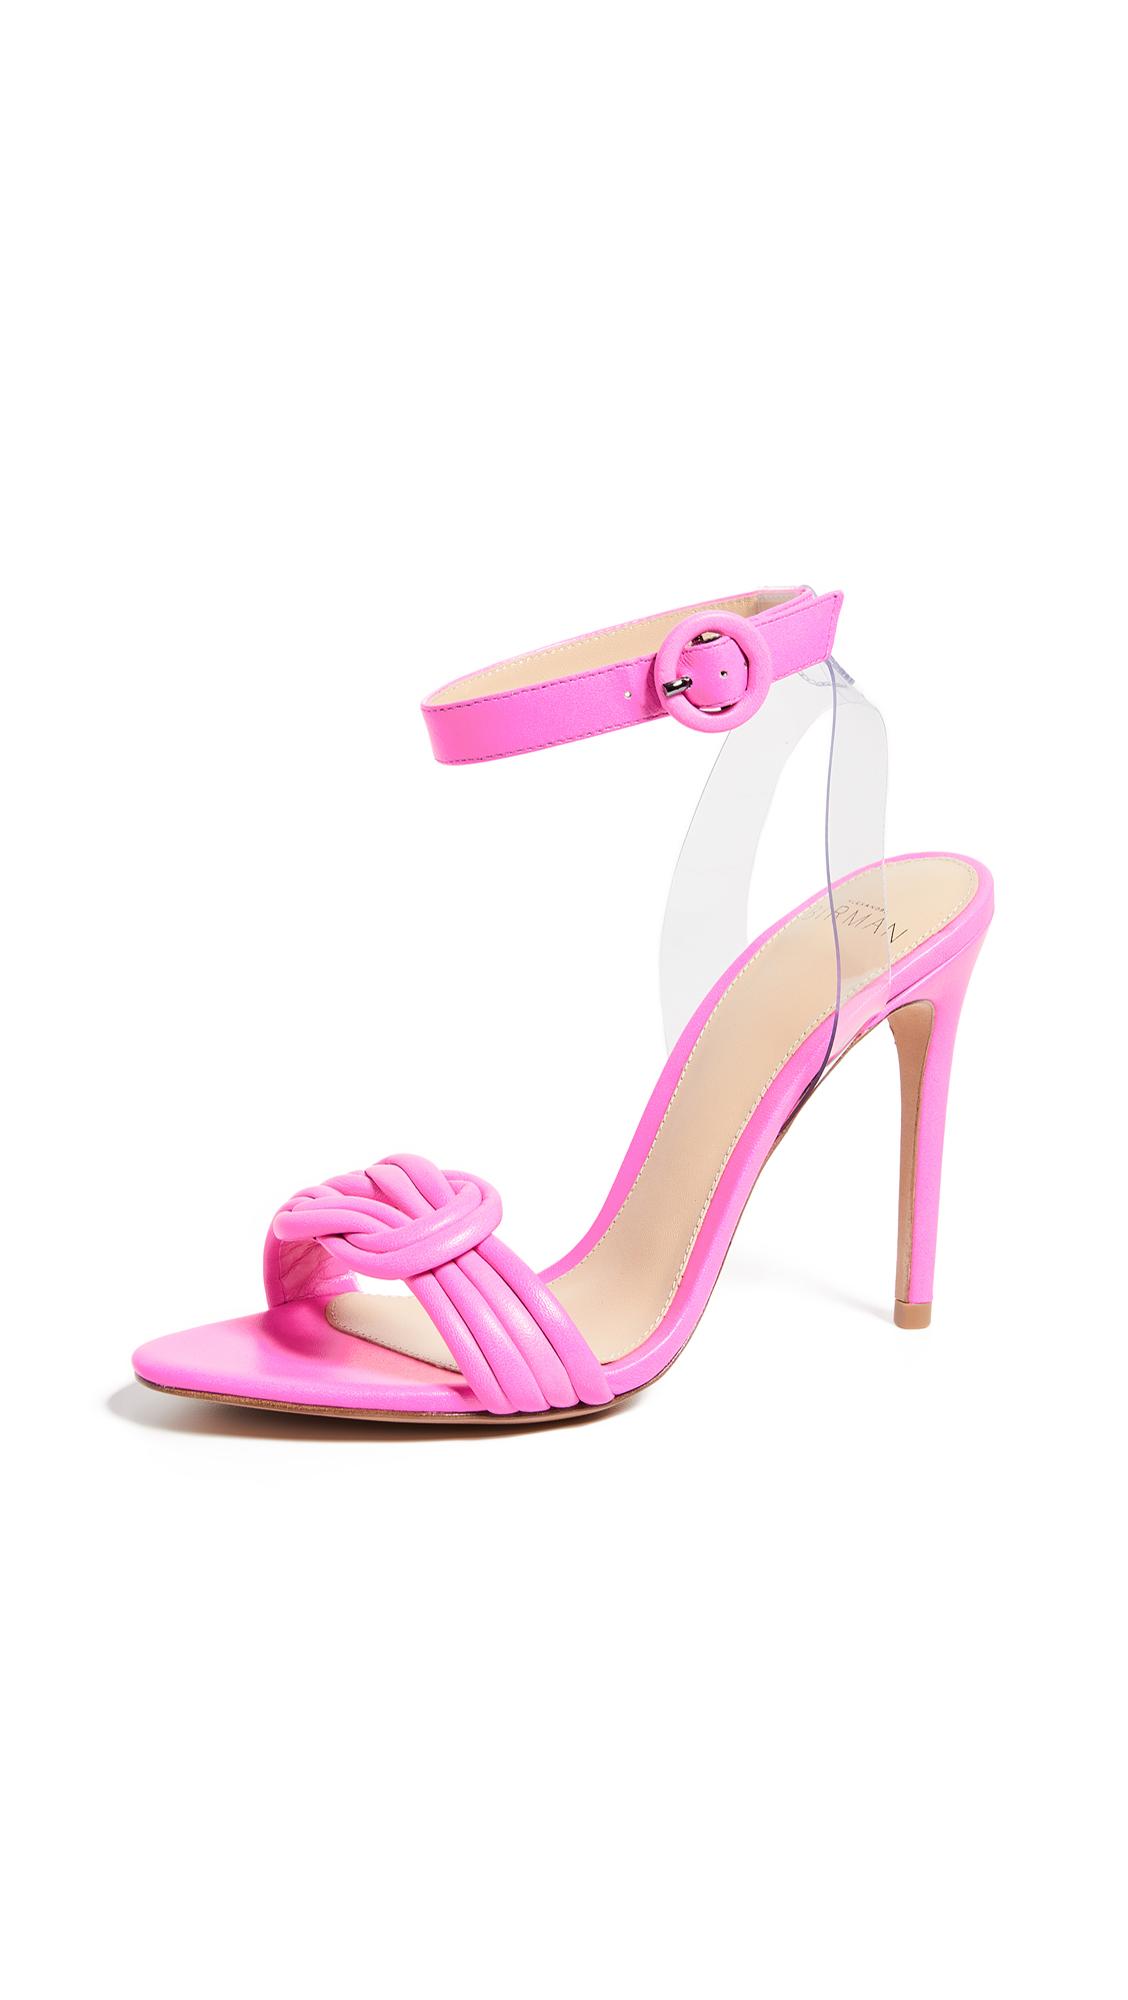 Alexandre Birman Vicky 100mm Sandals - Pink Fluo/Transparent